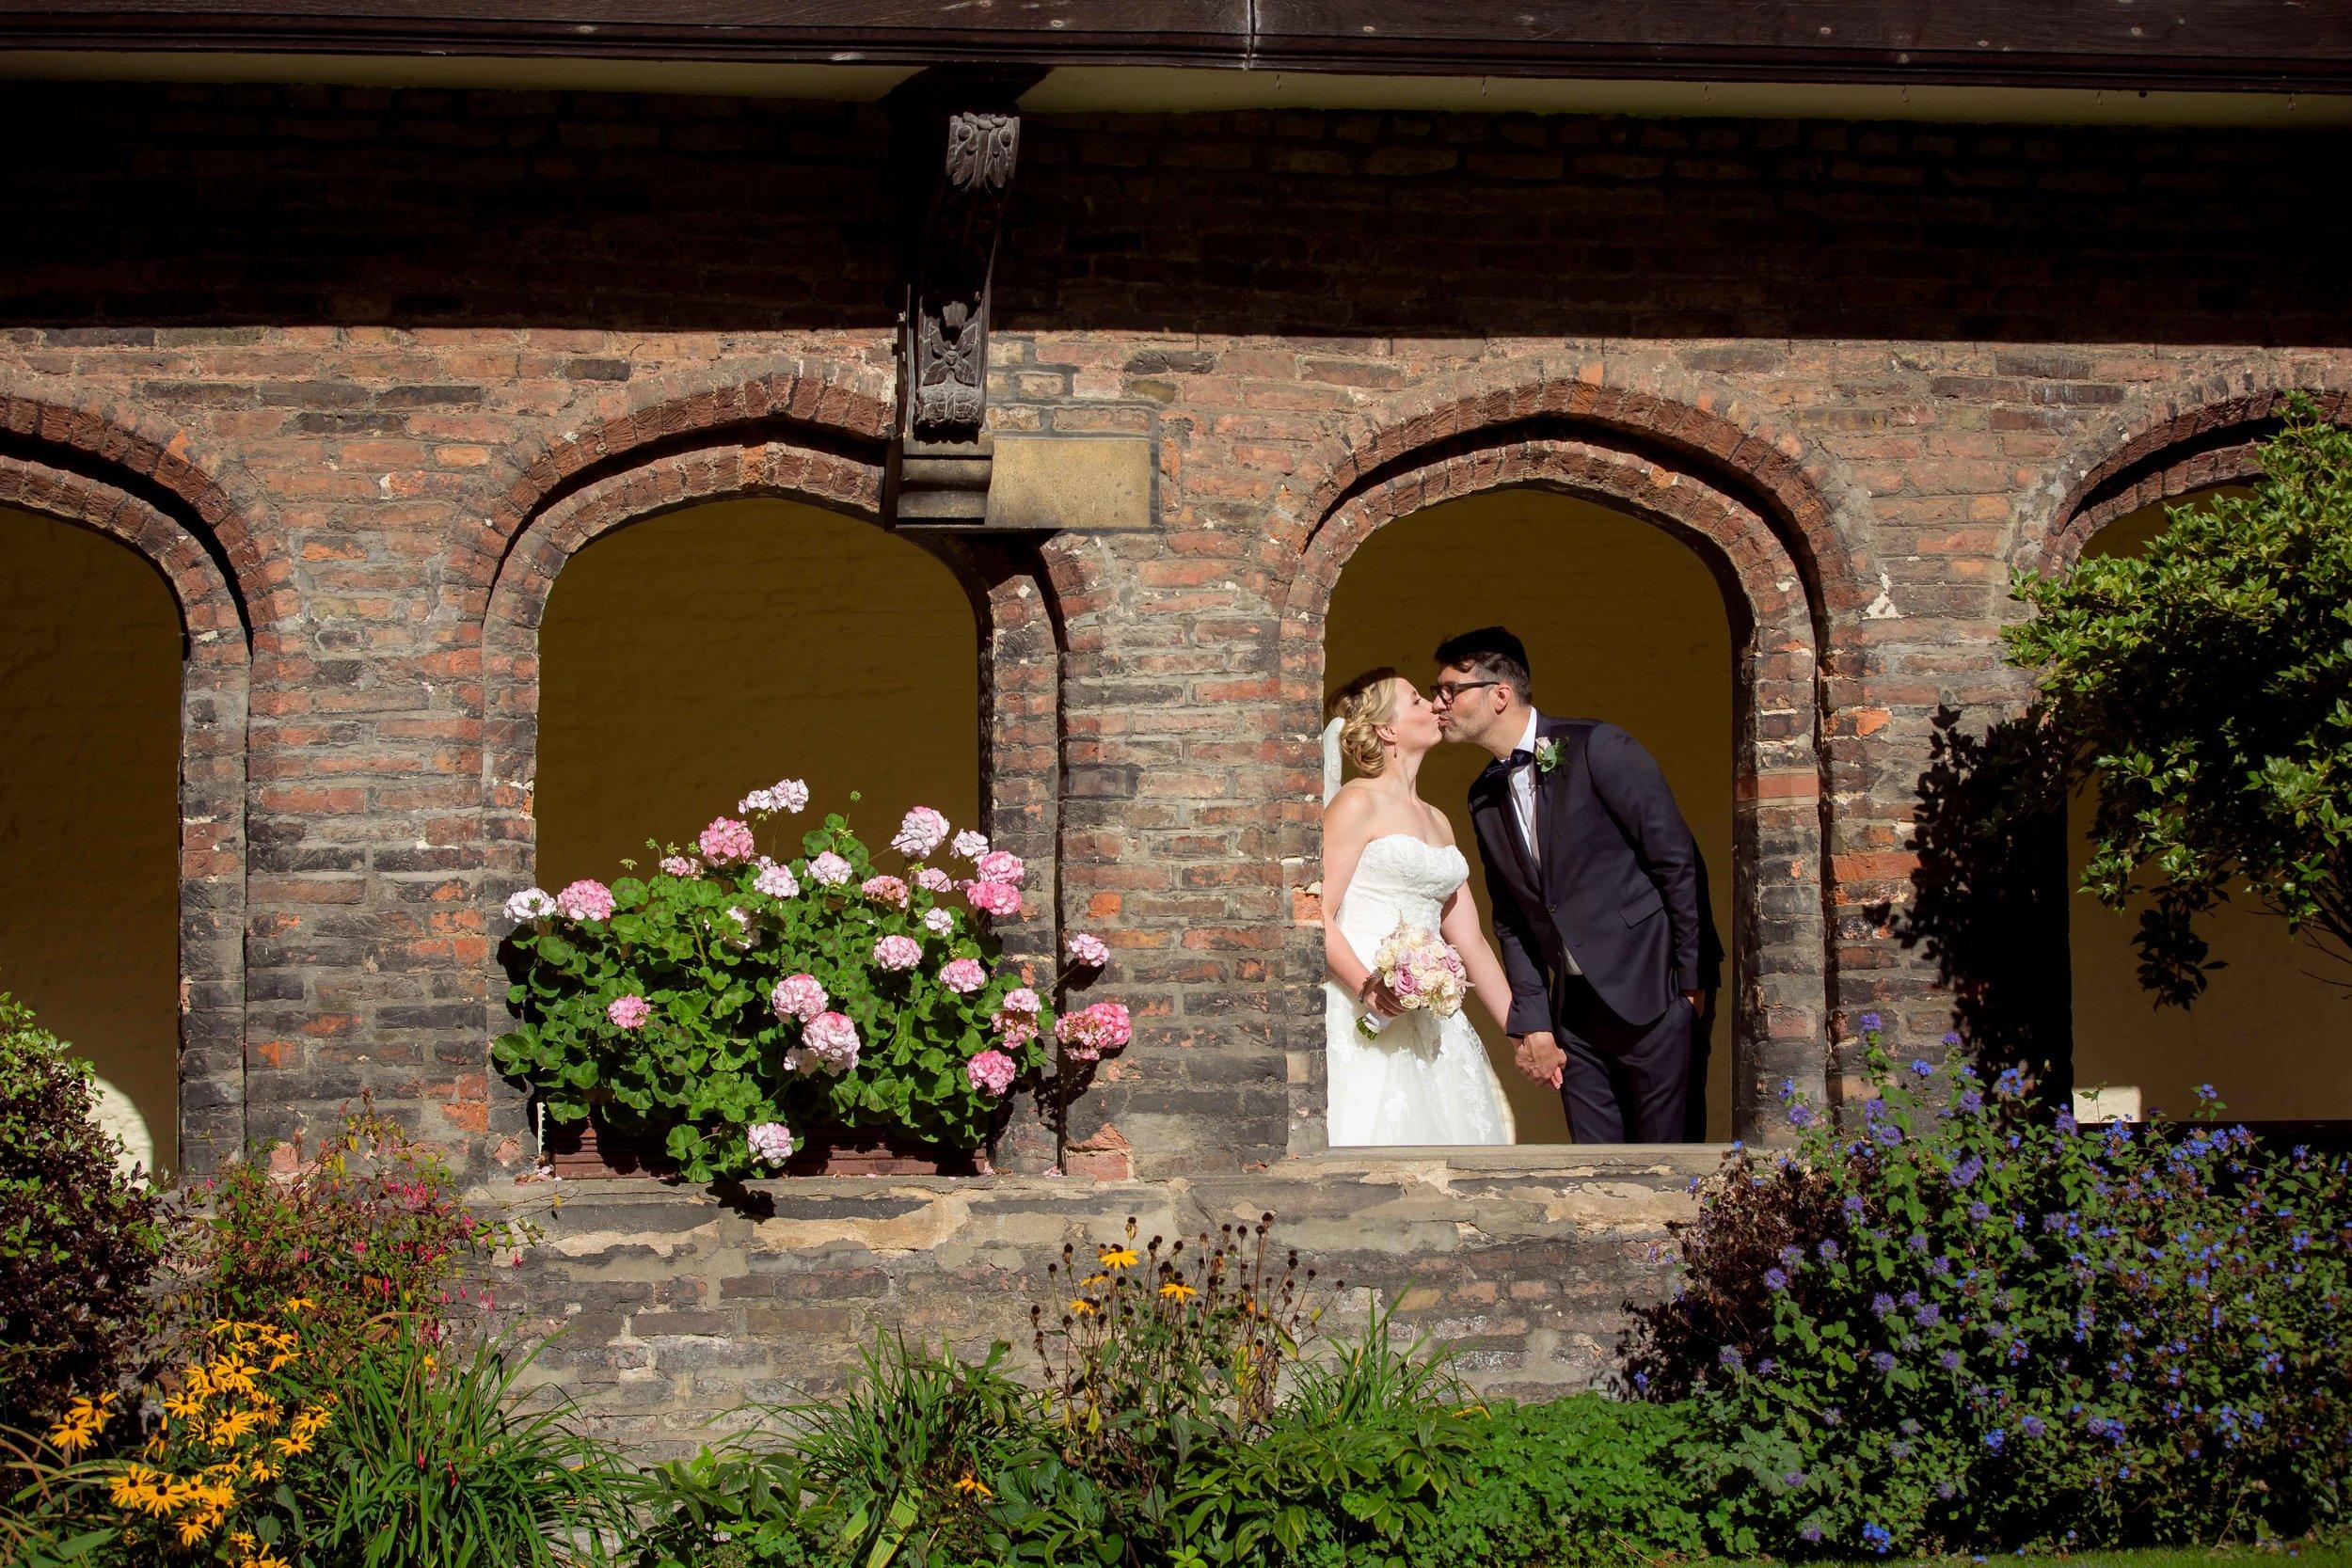 Adrian_Nicole_Charnwood_Weddings_Queens_College_Cambridge-1030.jpg